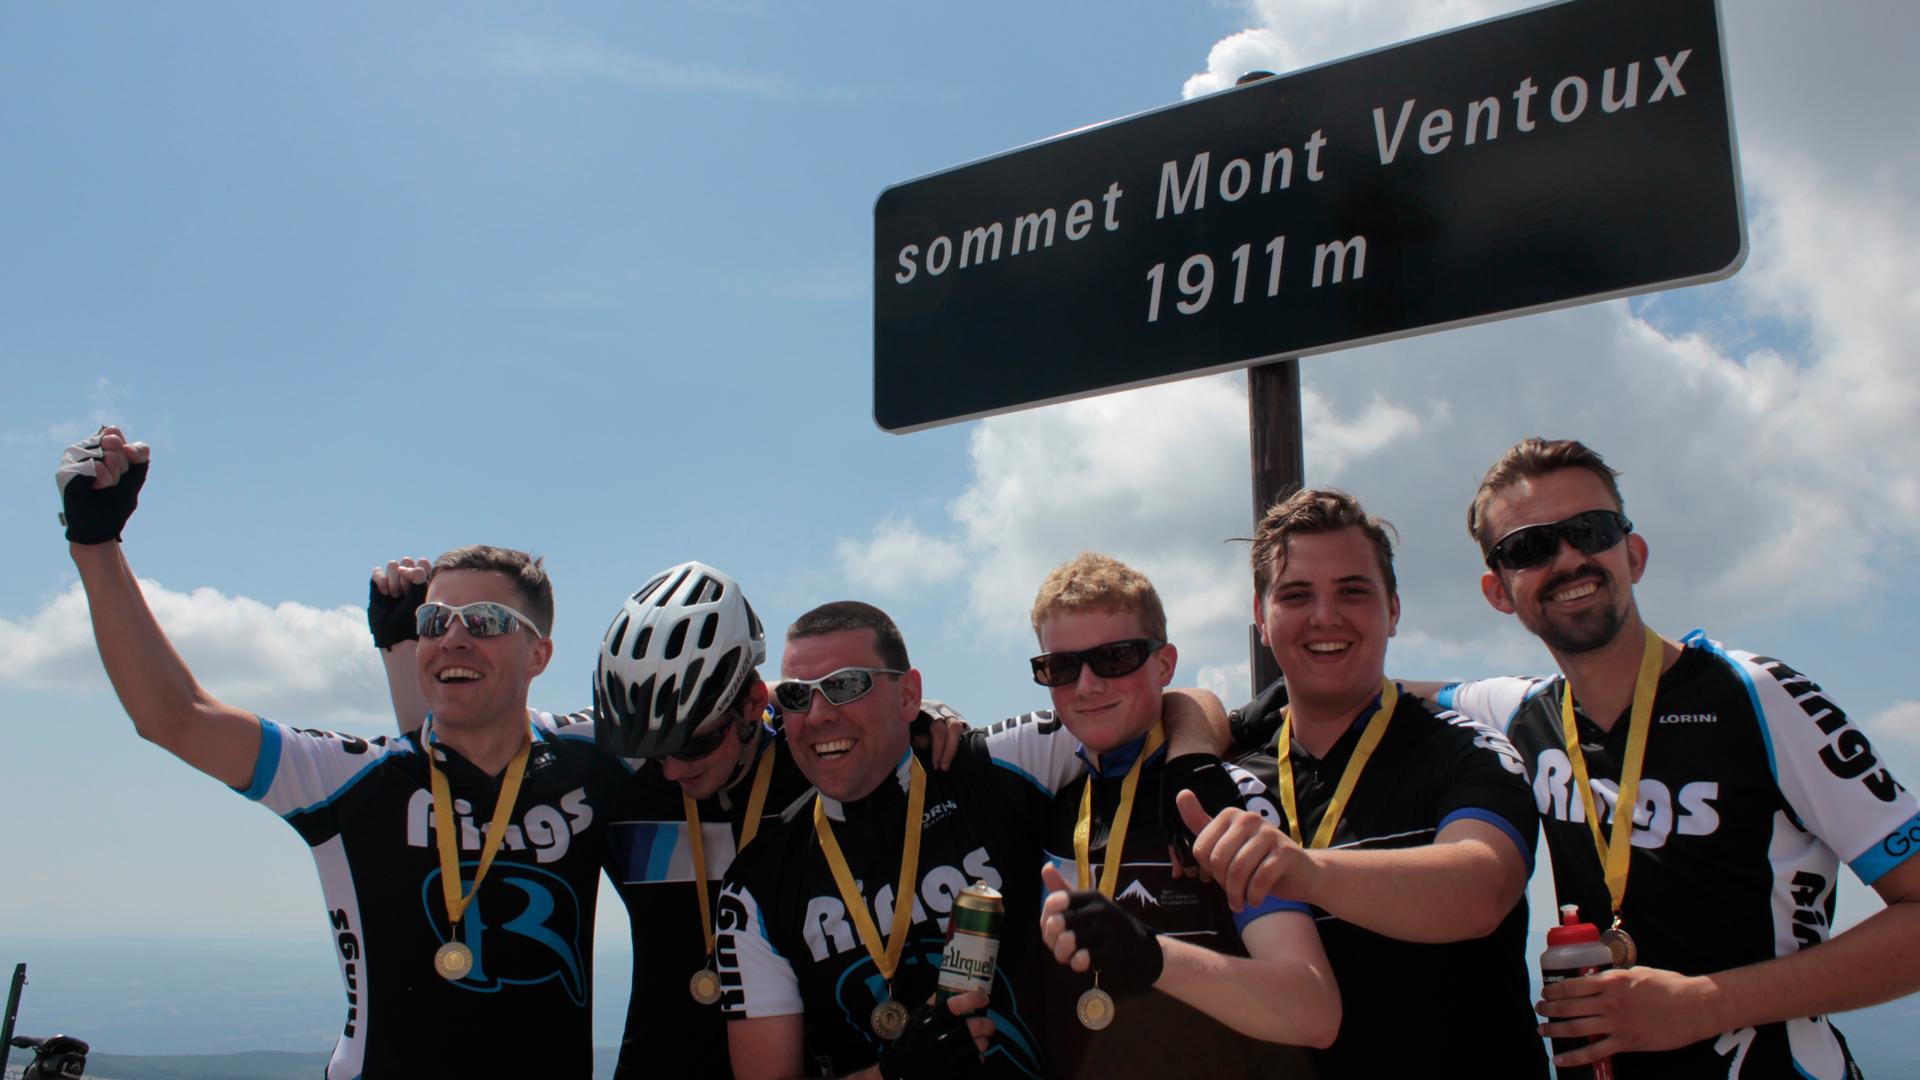 Goed doel: Team Mont Ventoux